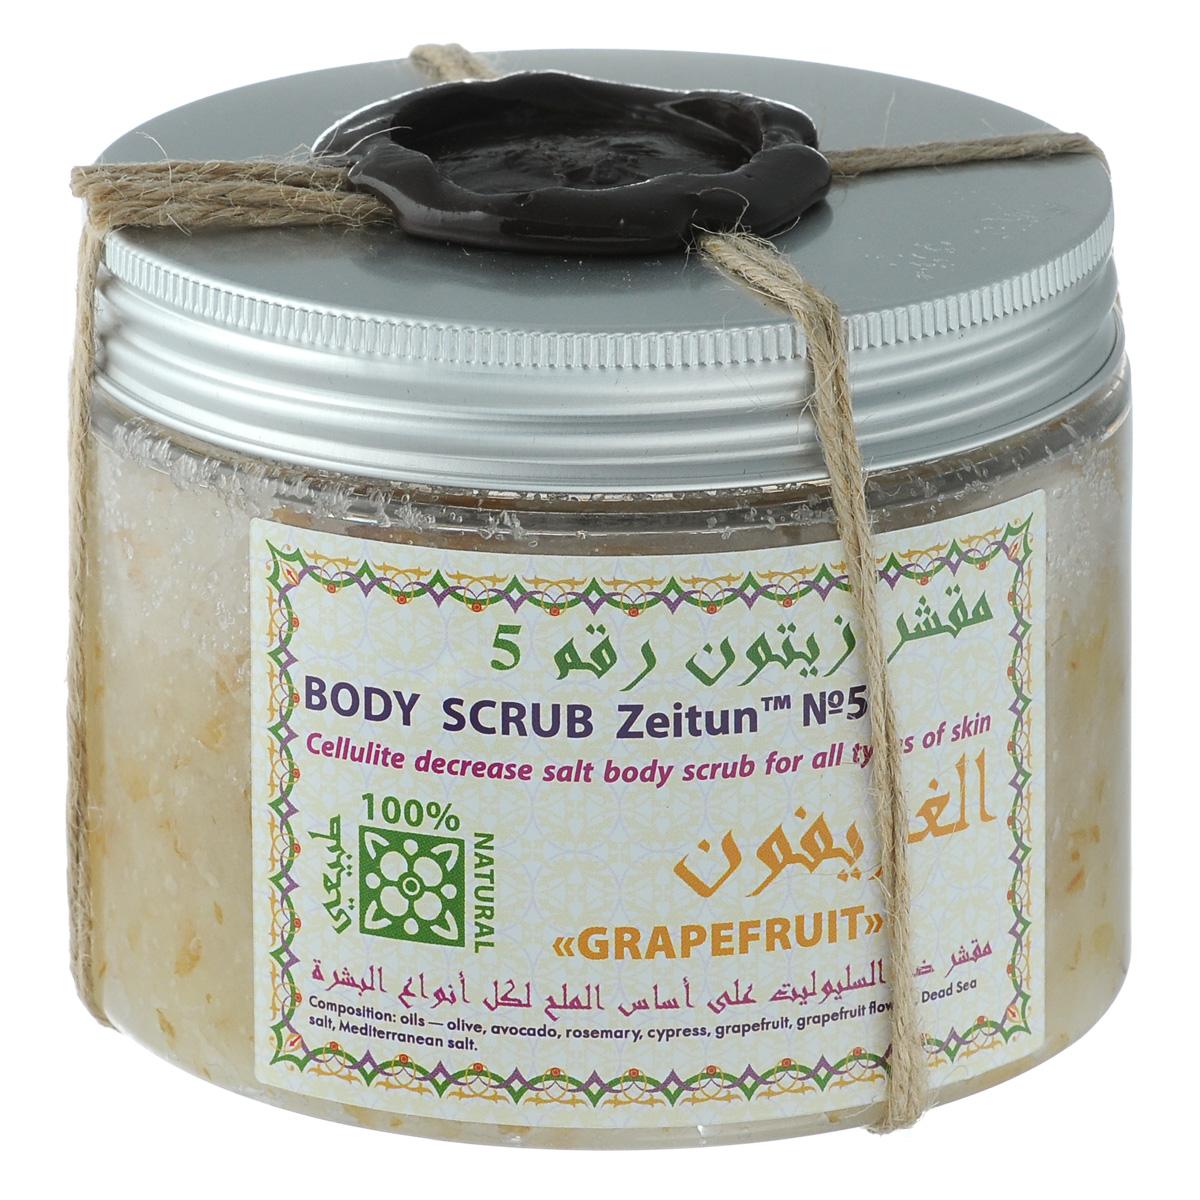 Зейтун Скраб для тела №5 солевой Грейпфрут, 500 мл маска для тела обертывание зейтун омолаживающее с золотом зейтун